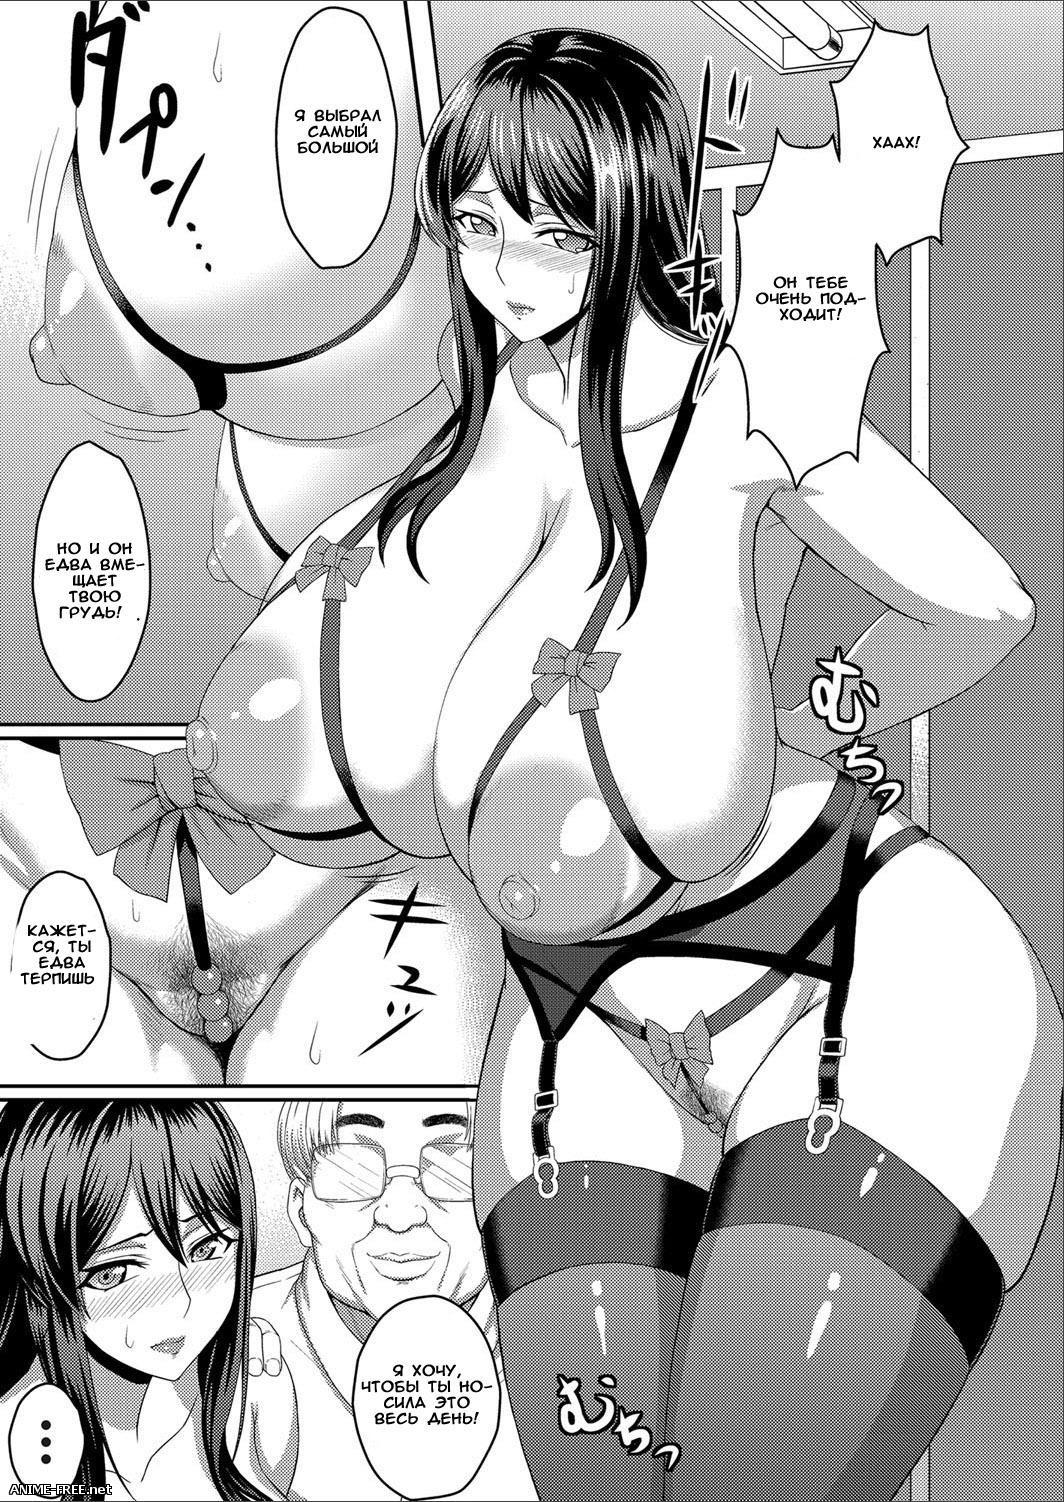 Kuroharuto (Collection) - Сборник хентай манги [Cen] [RUS,ENG,JAP] Manga Hentai